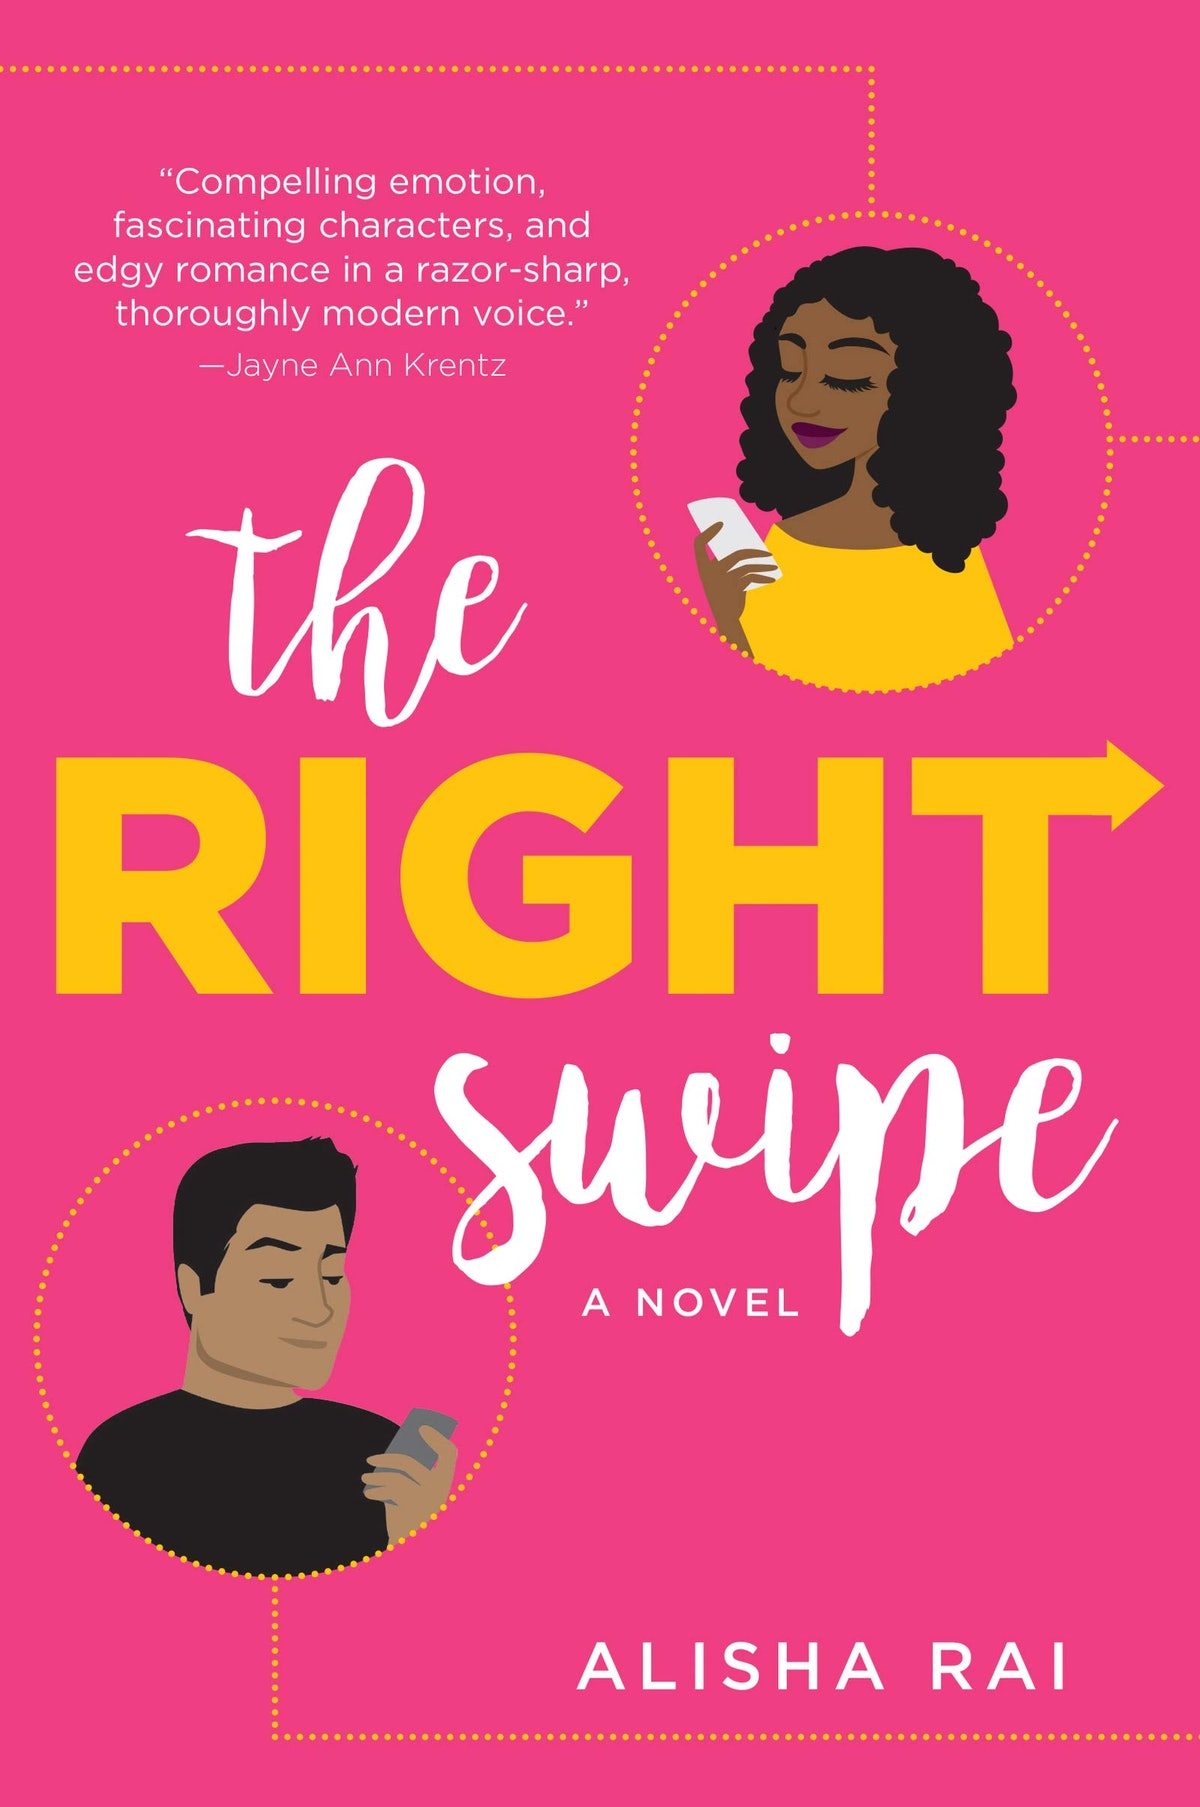 'The Right Swipe' by Alisha Rai